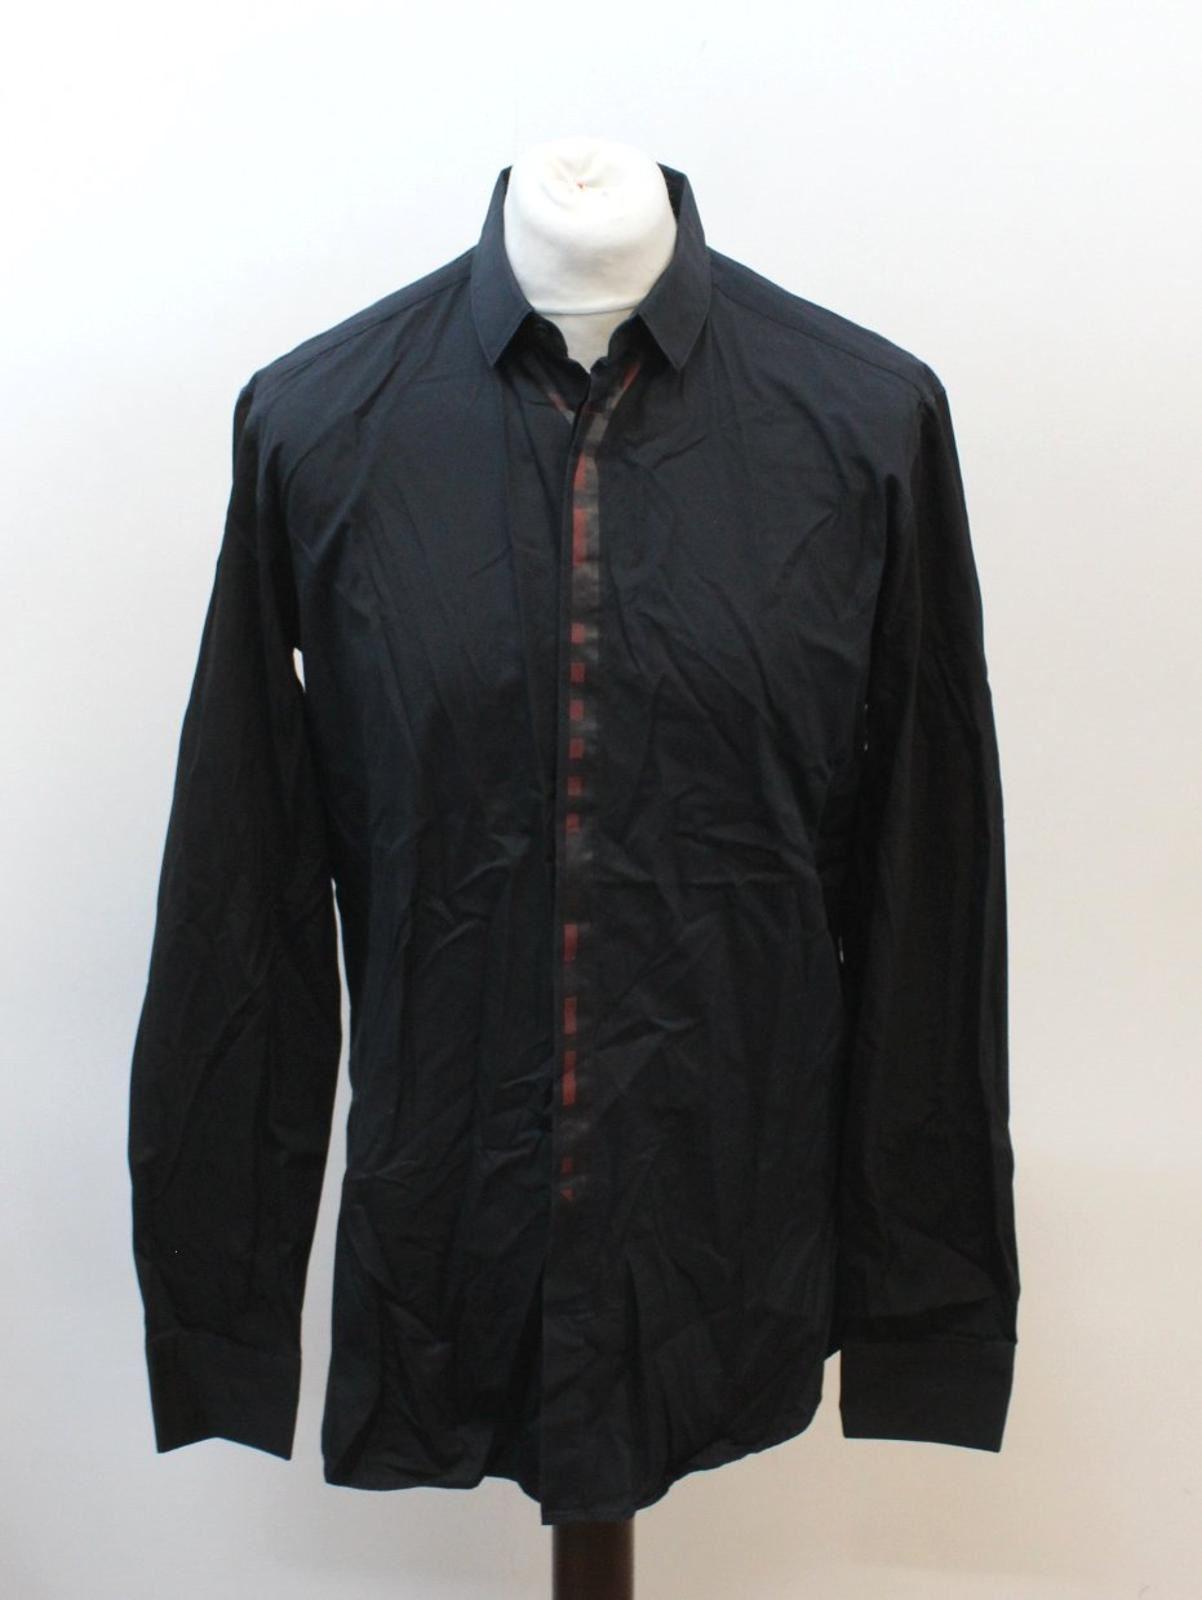 Neil-Barrett-Hombre-Azul-Manga-Negra-Cuello-Camisa-de-impresion-Corbata-Slim-Fit-16-5-034-42cm